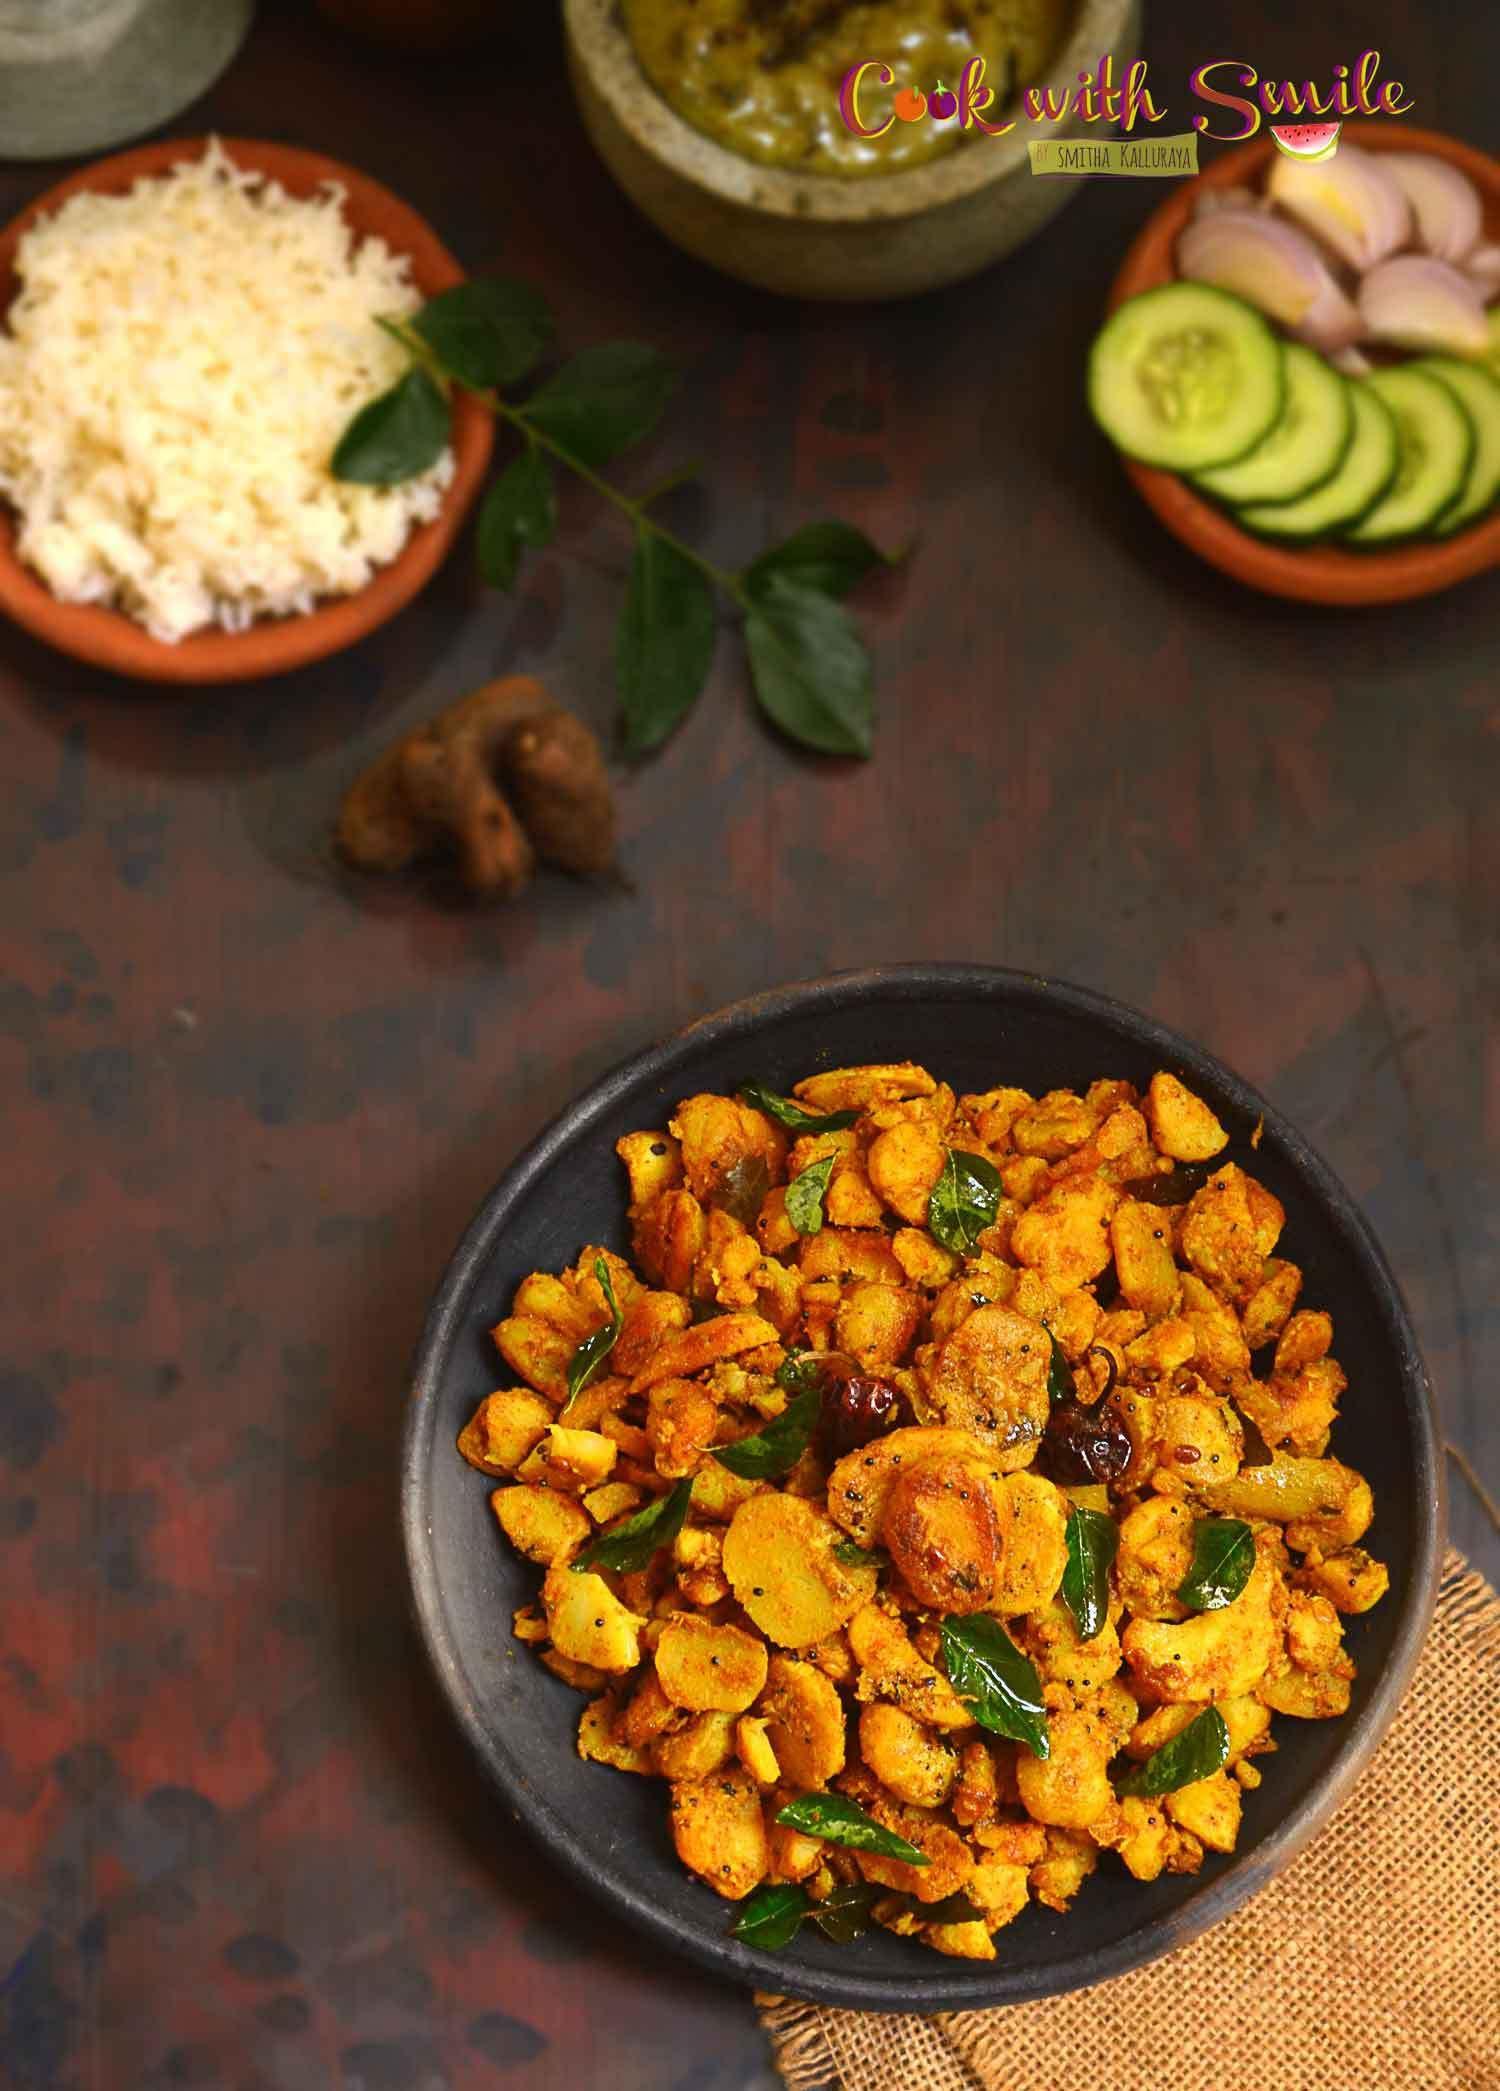 Chinese potato indian stir fry recipe / sambrani gadde